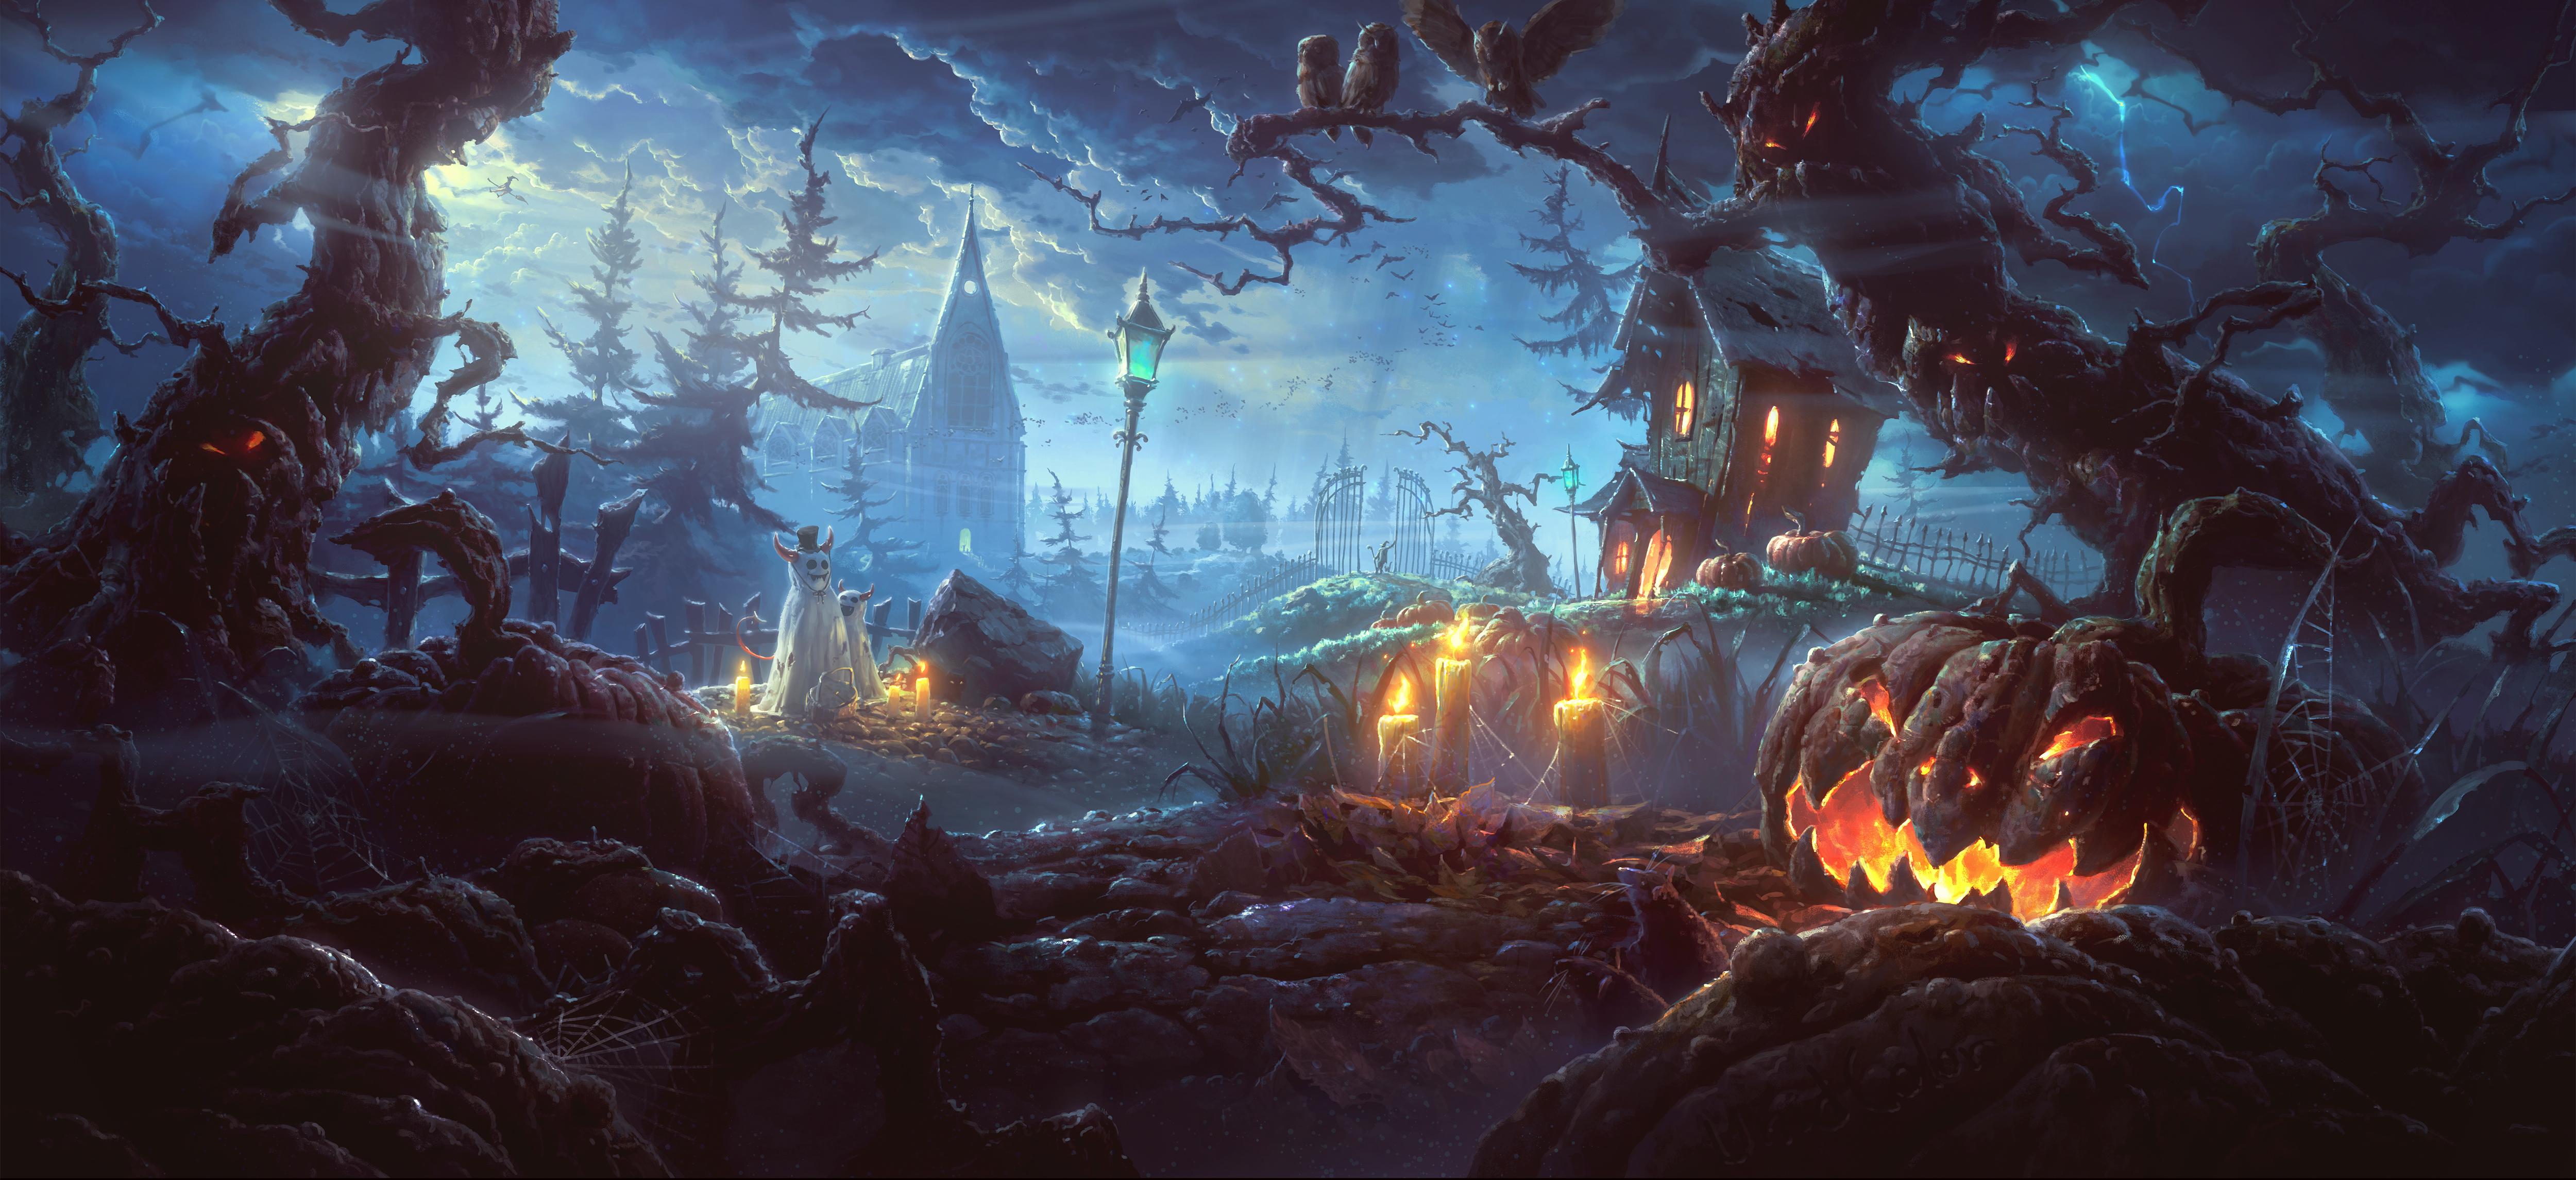 Holiday Jack o lantern Village Scary Halloween Night 5000x2290